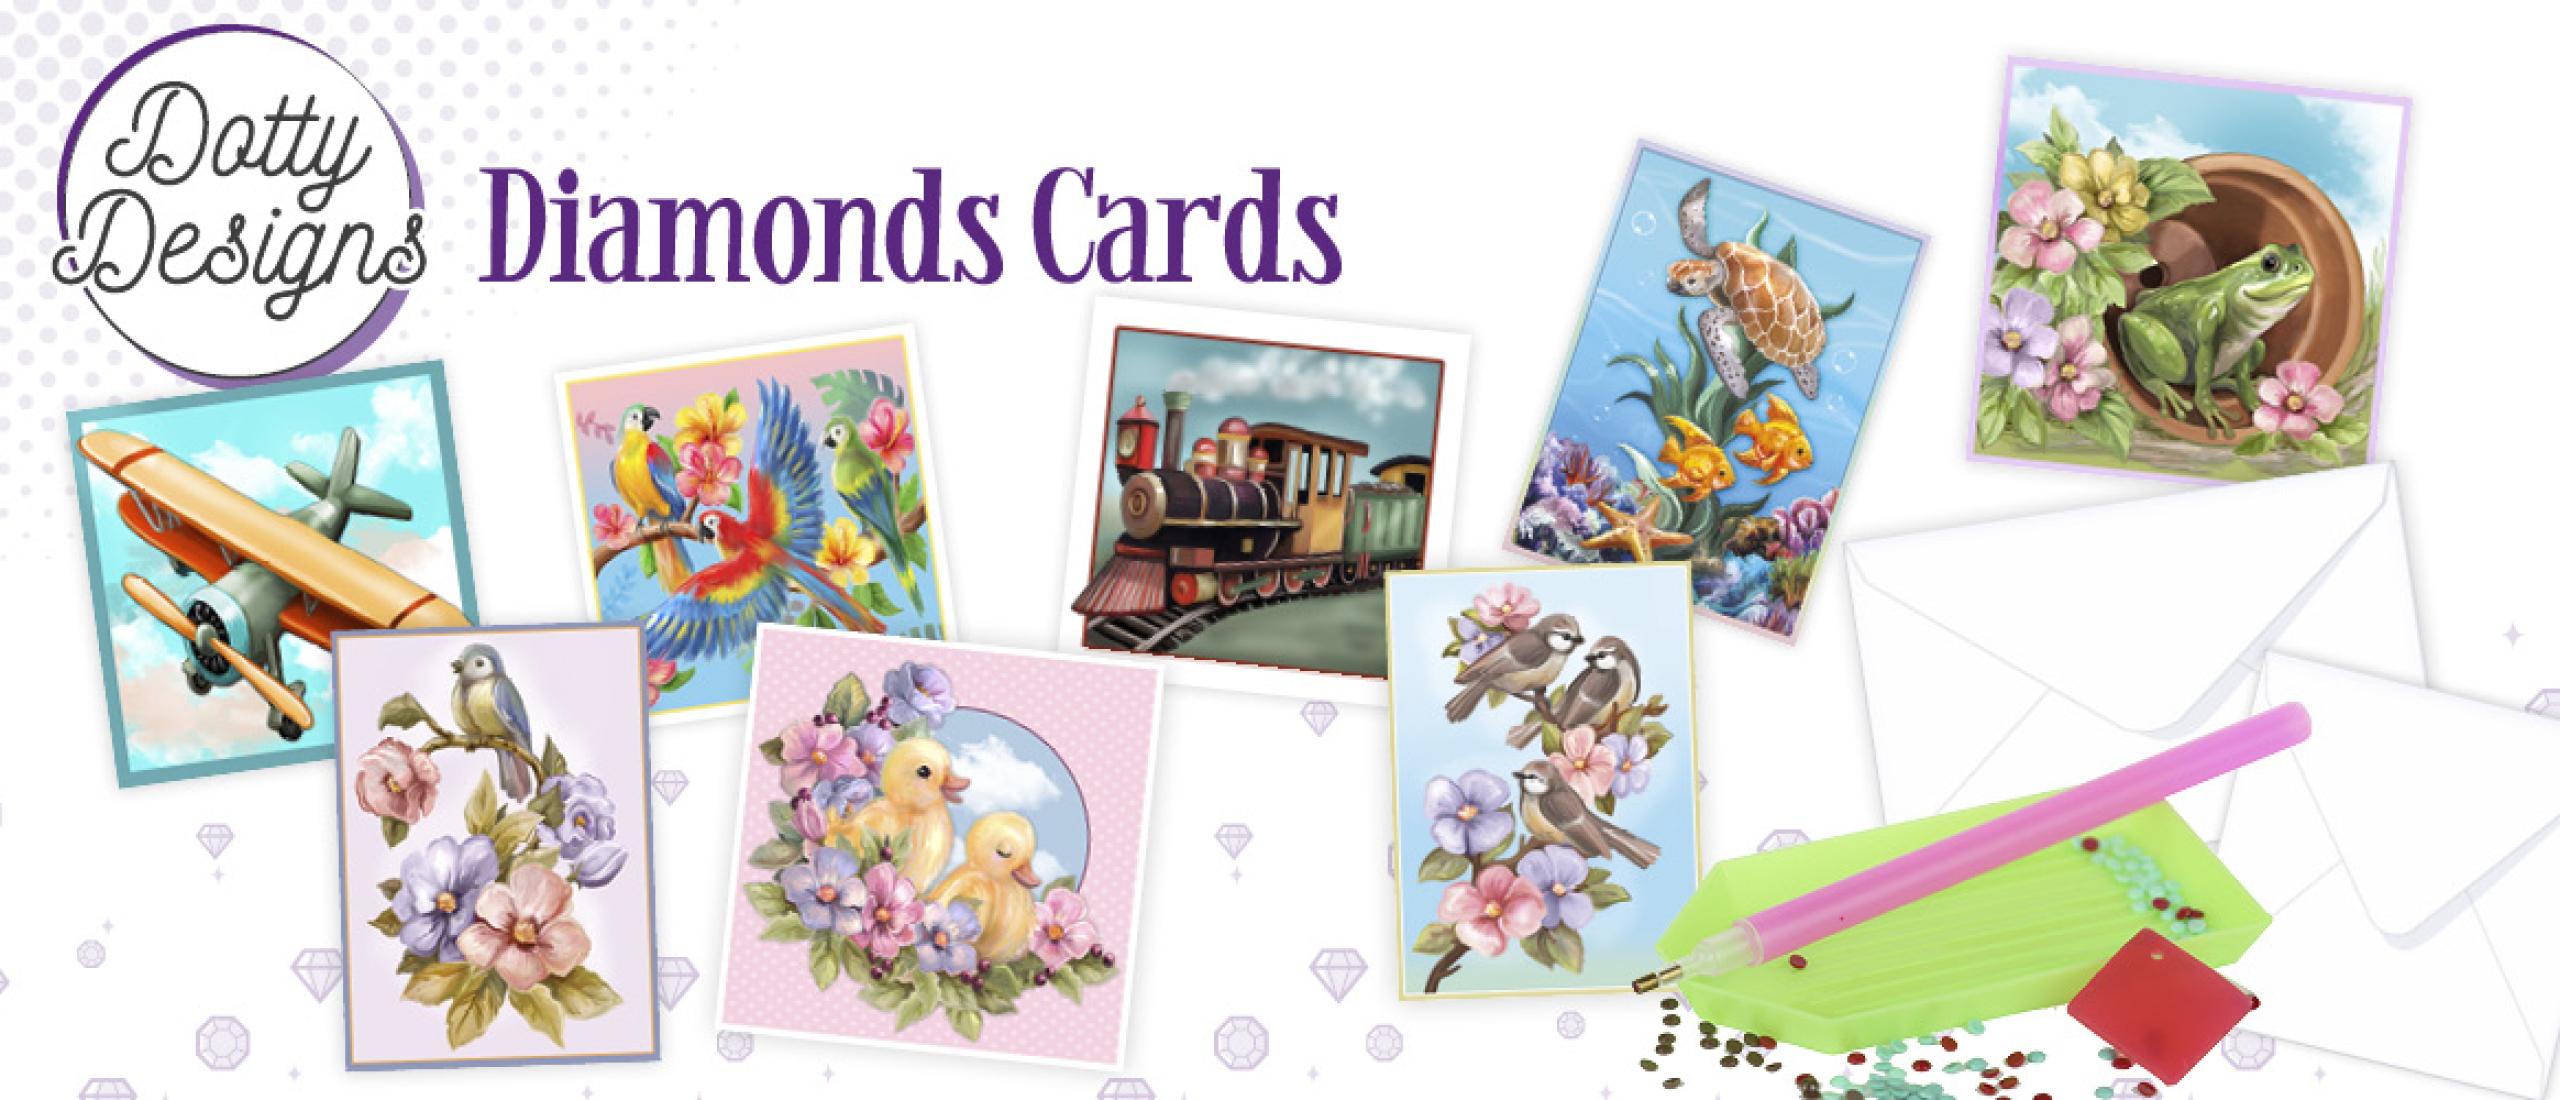 Dotty Designs Diamond Cards 10033-10040